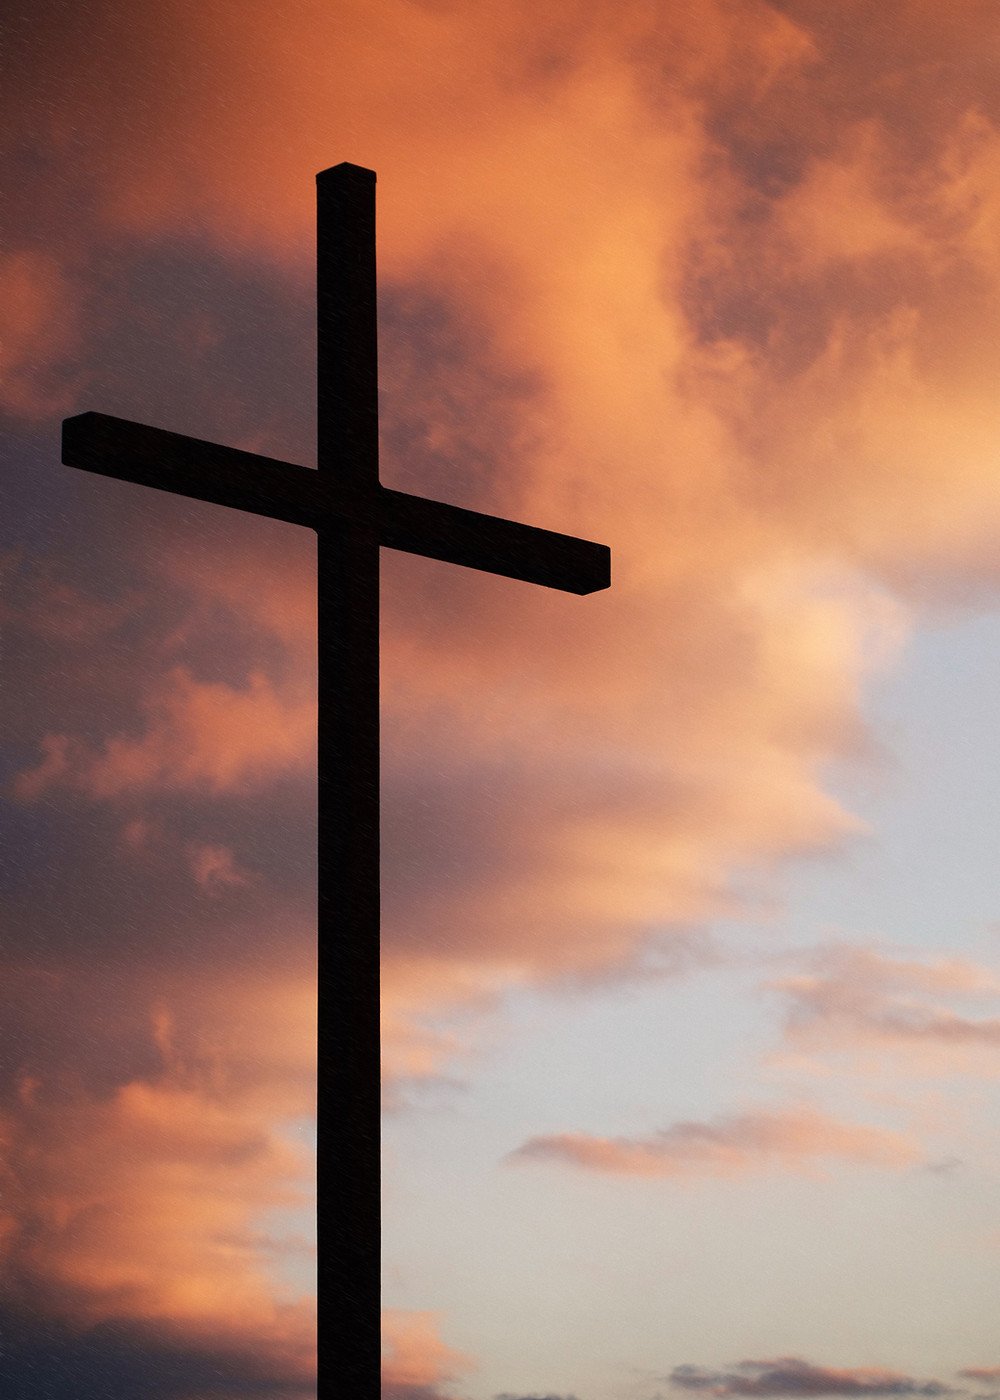 FINDING A COPTIC CHRISTIAN CHURCH NEAR ME